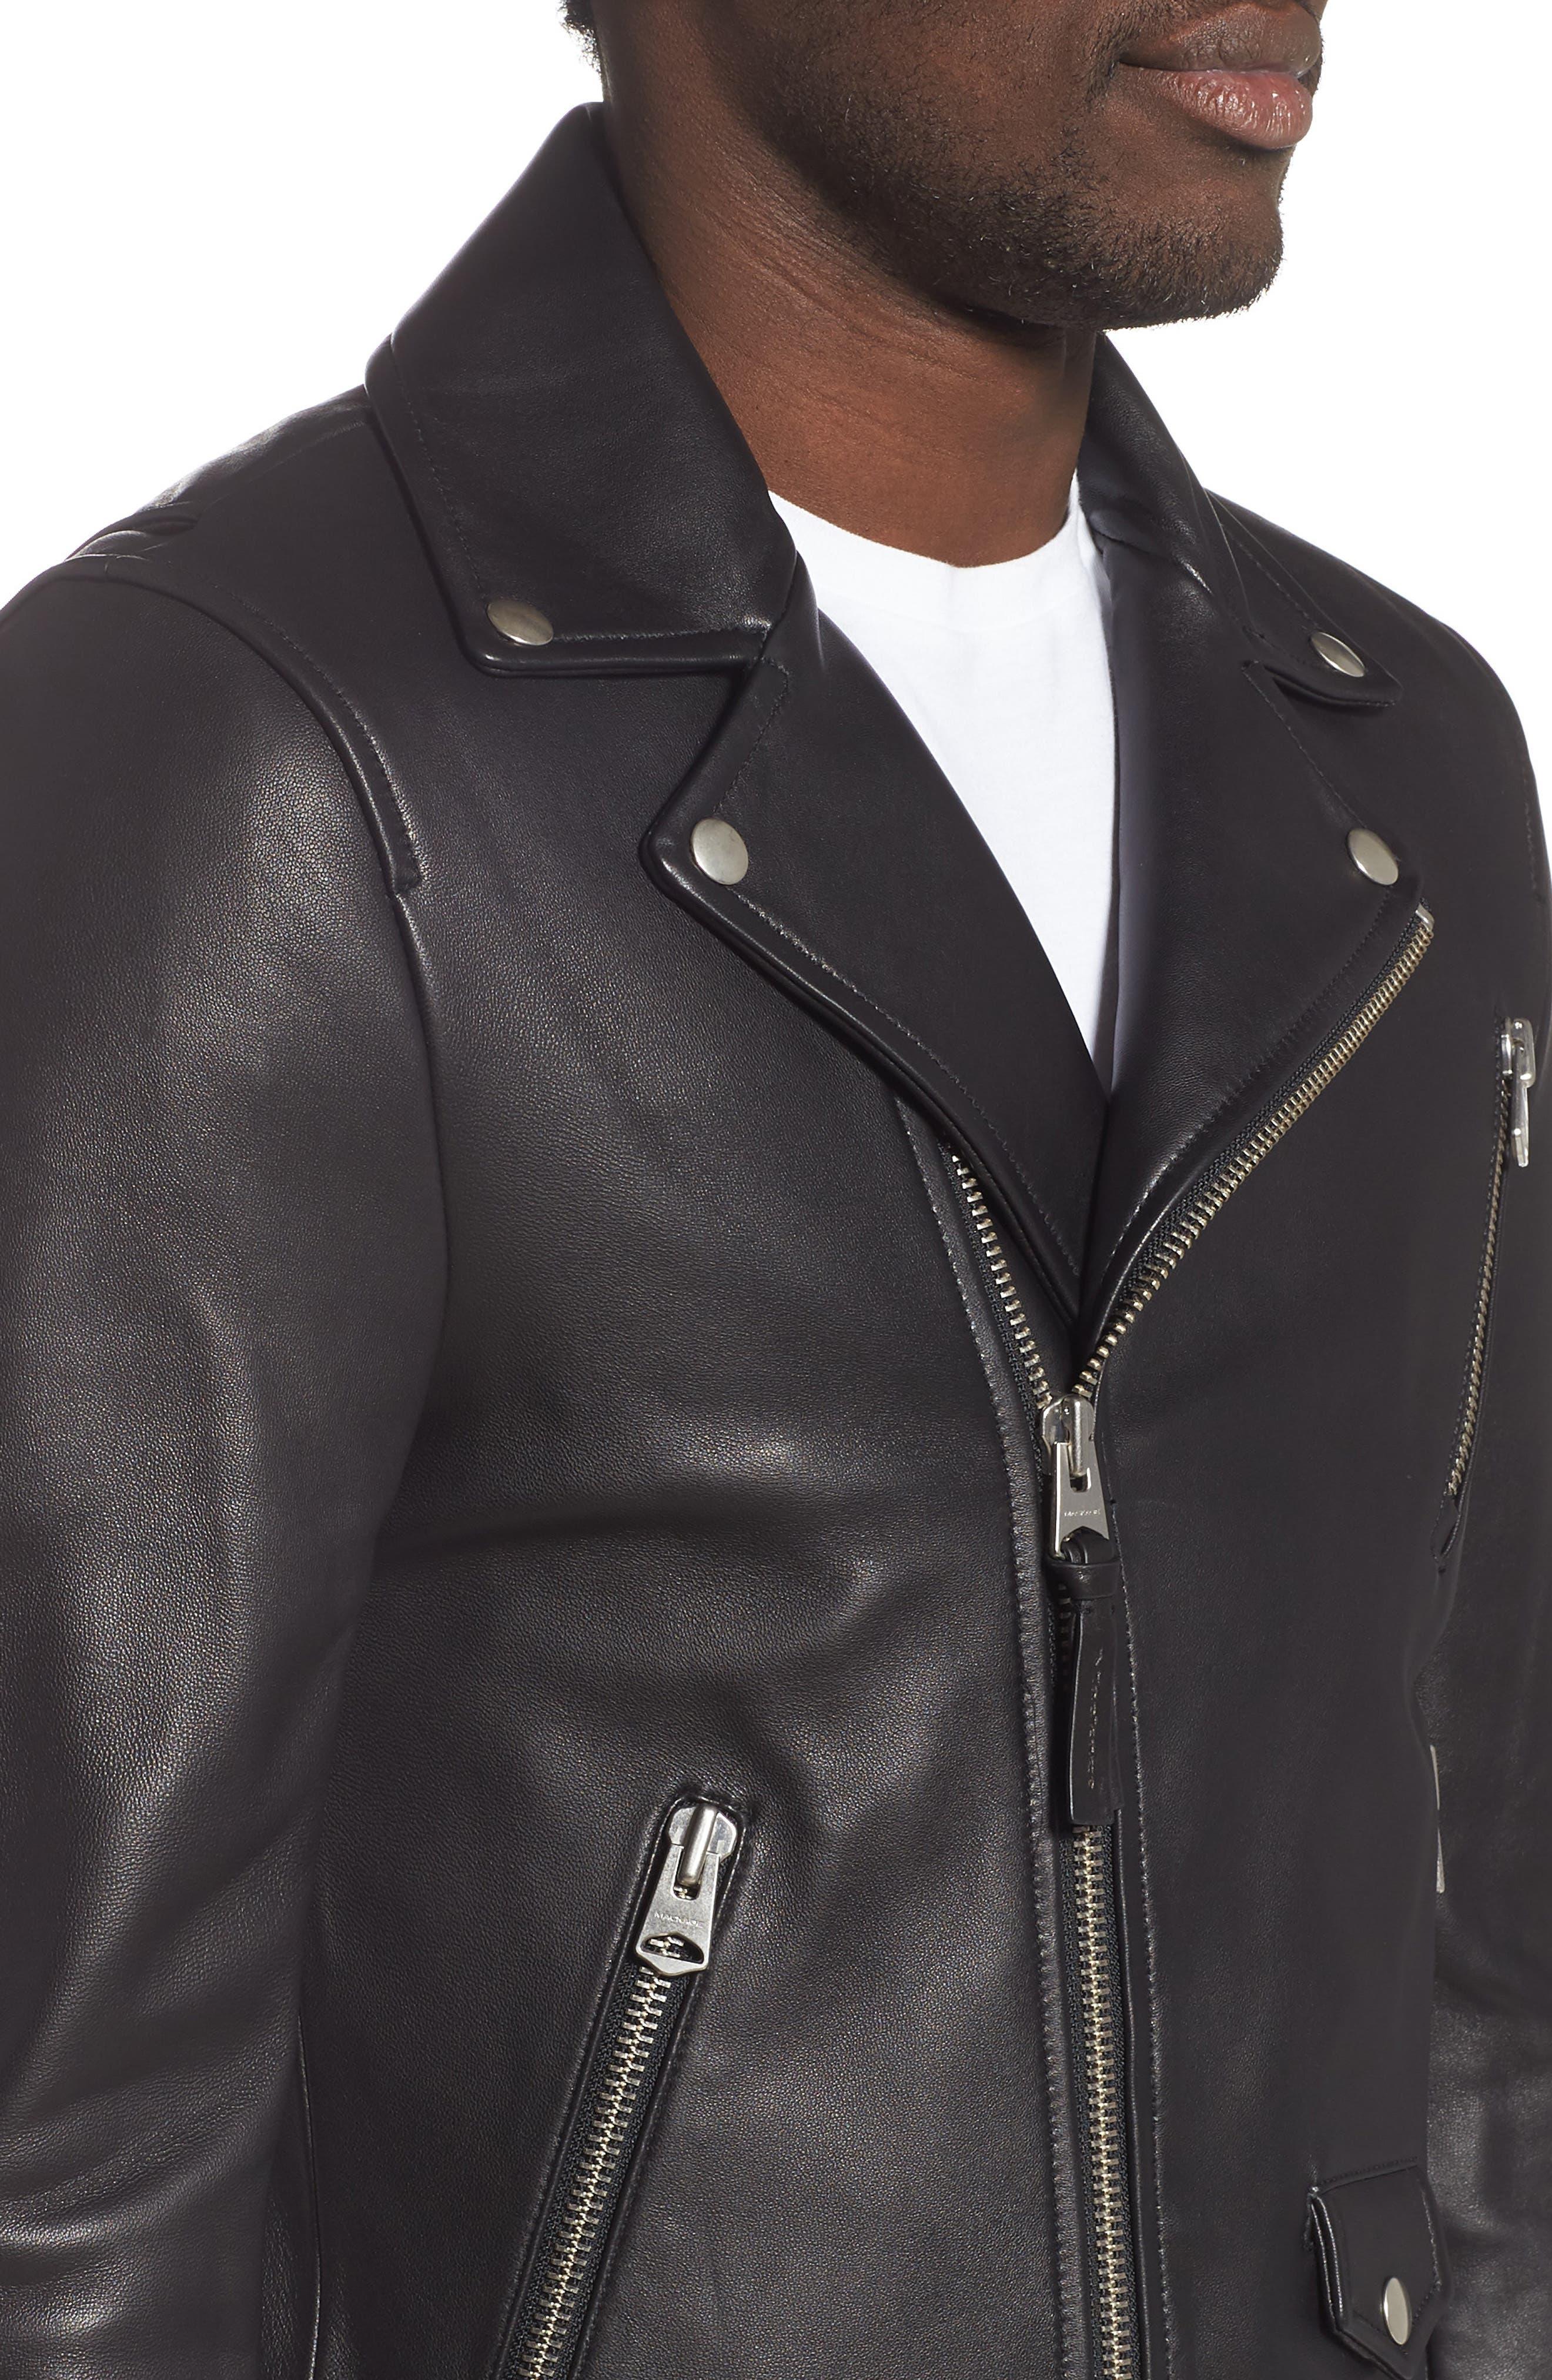 MACKAGE, Fenton Leather Moto Jacket, Alternate thumbnail 4, color, BLACK